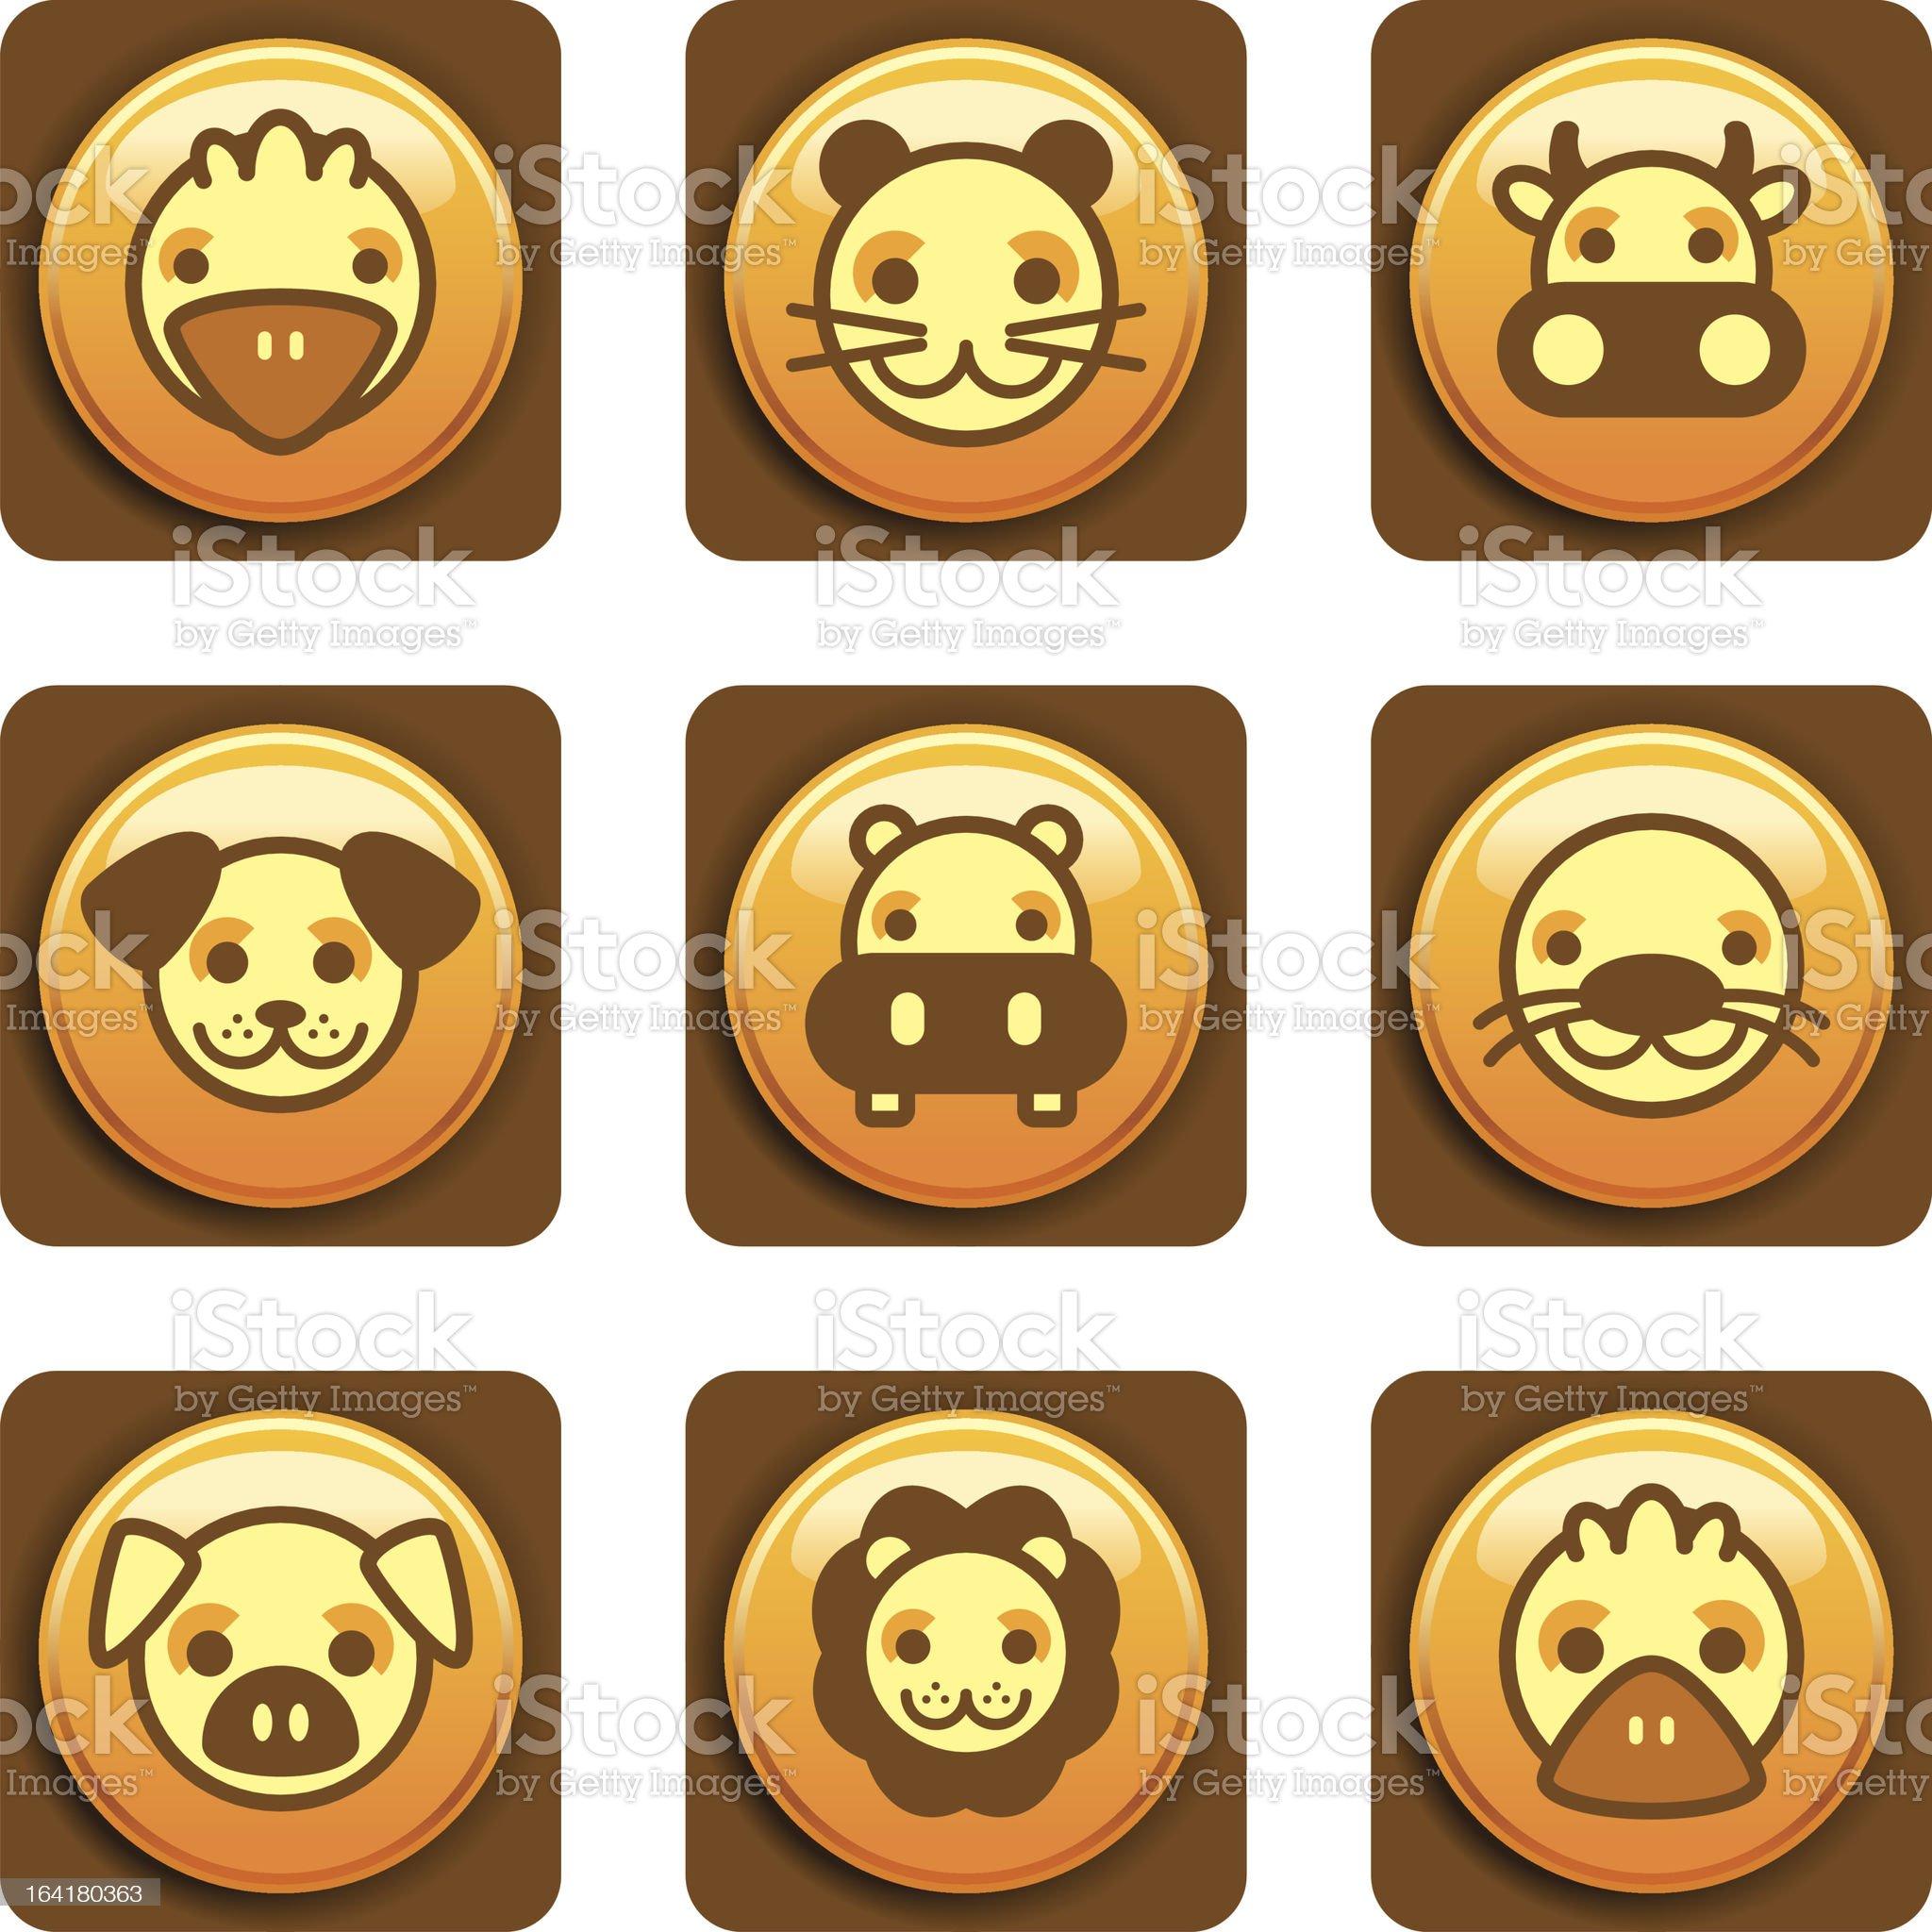 Animal Icons royalty-free stock vector art